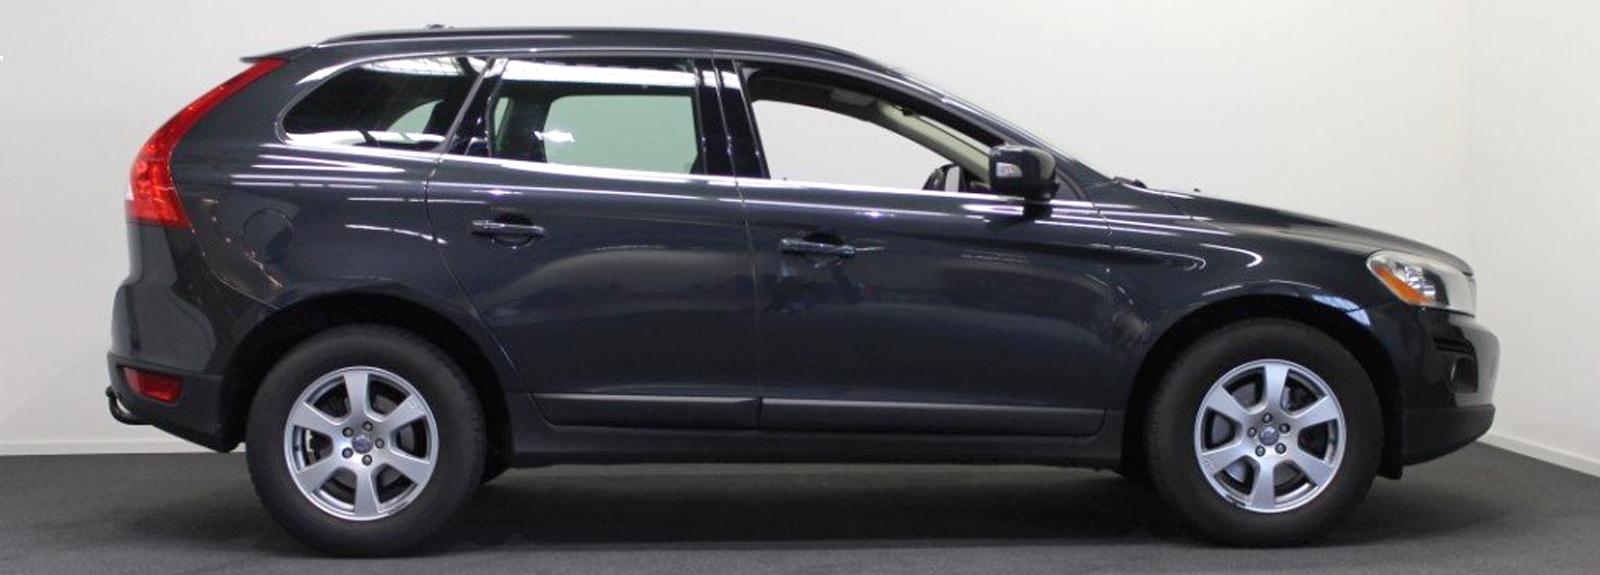 Tweedehands auto Volvo XC60